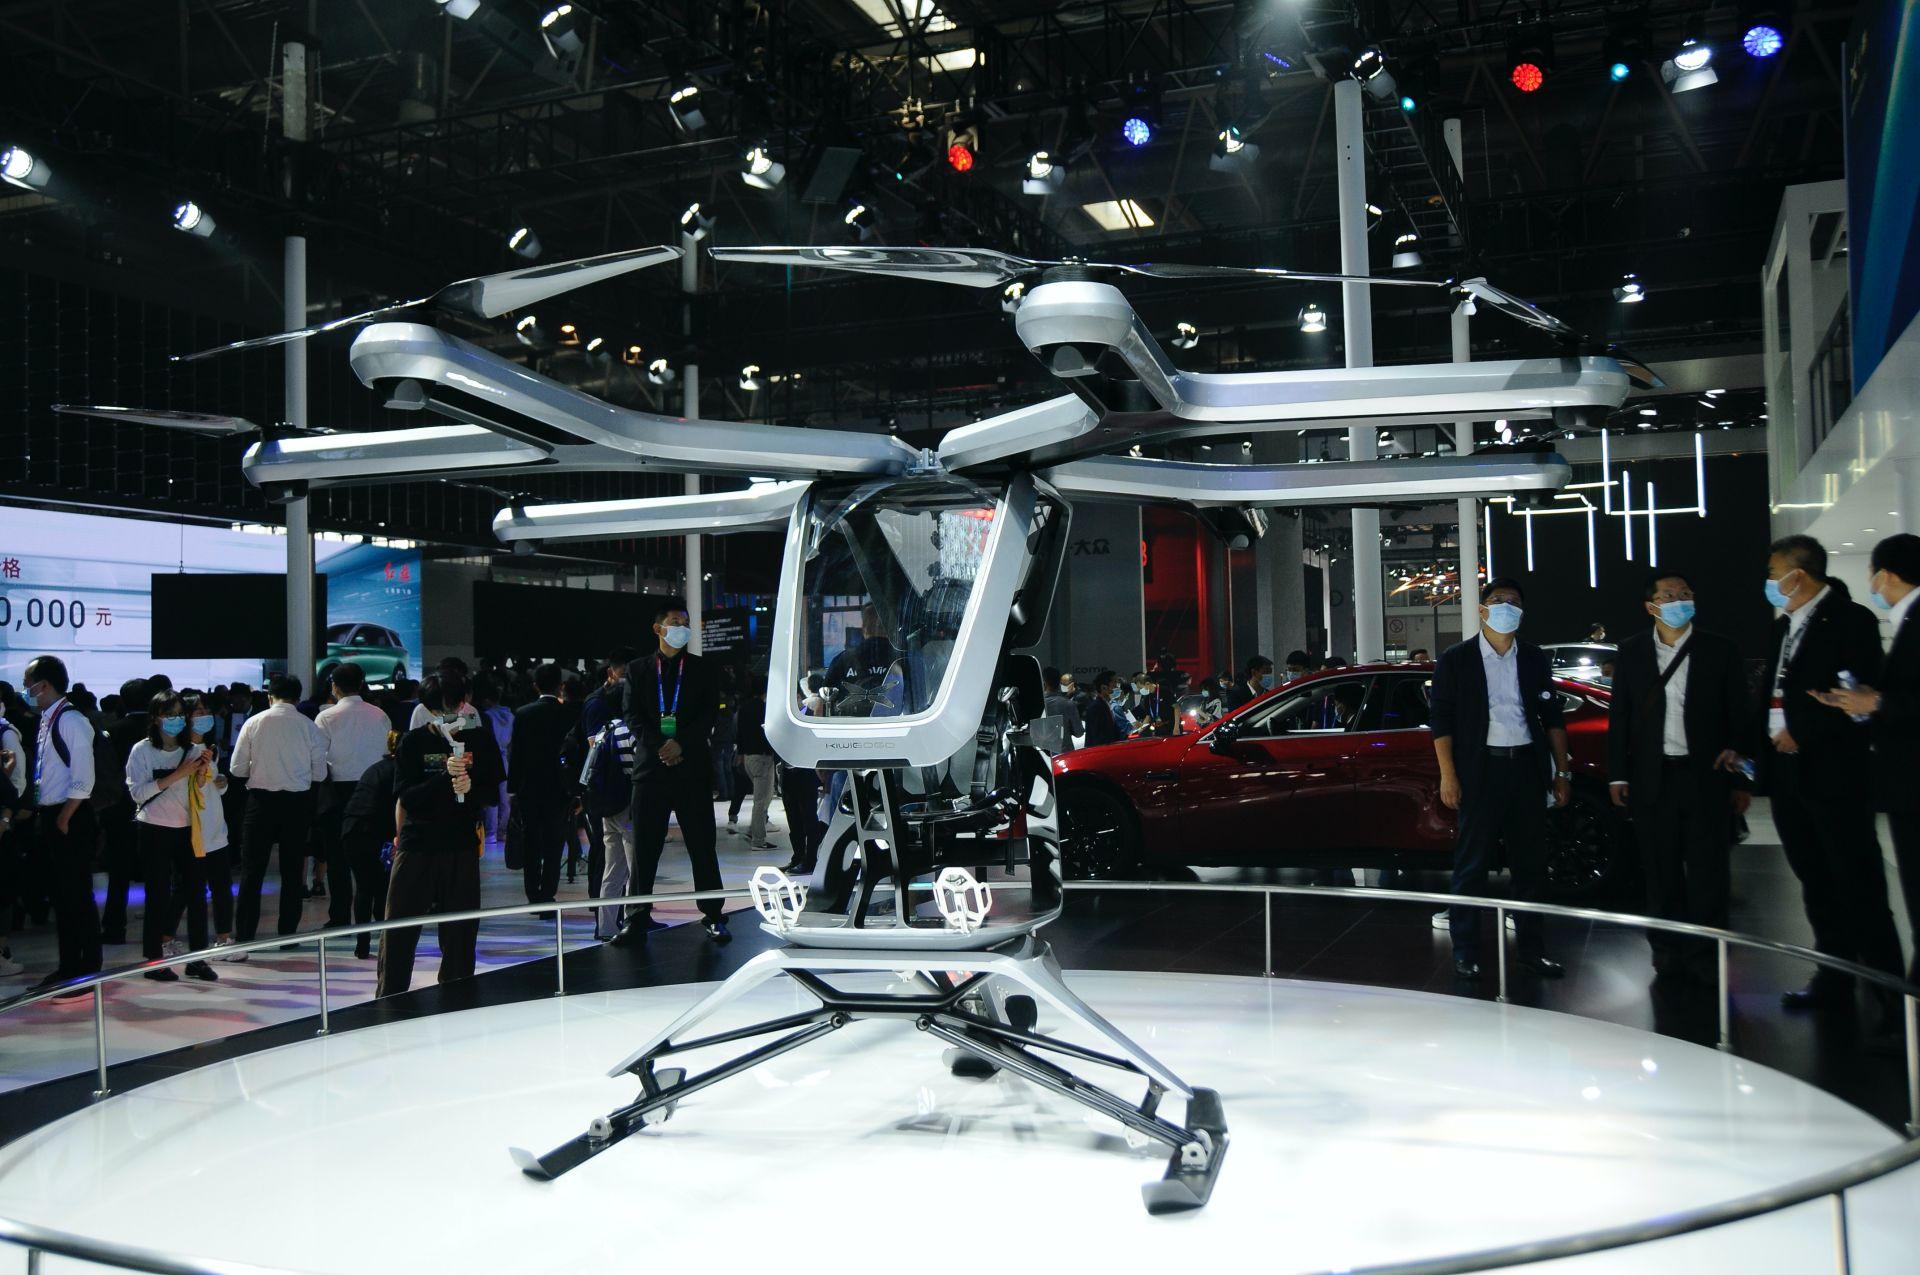 XPeng-Kiwigogo-flying-car-3.jpg